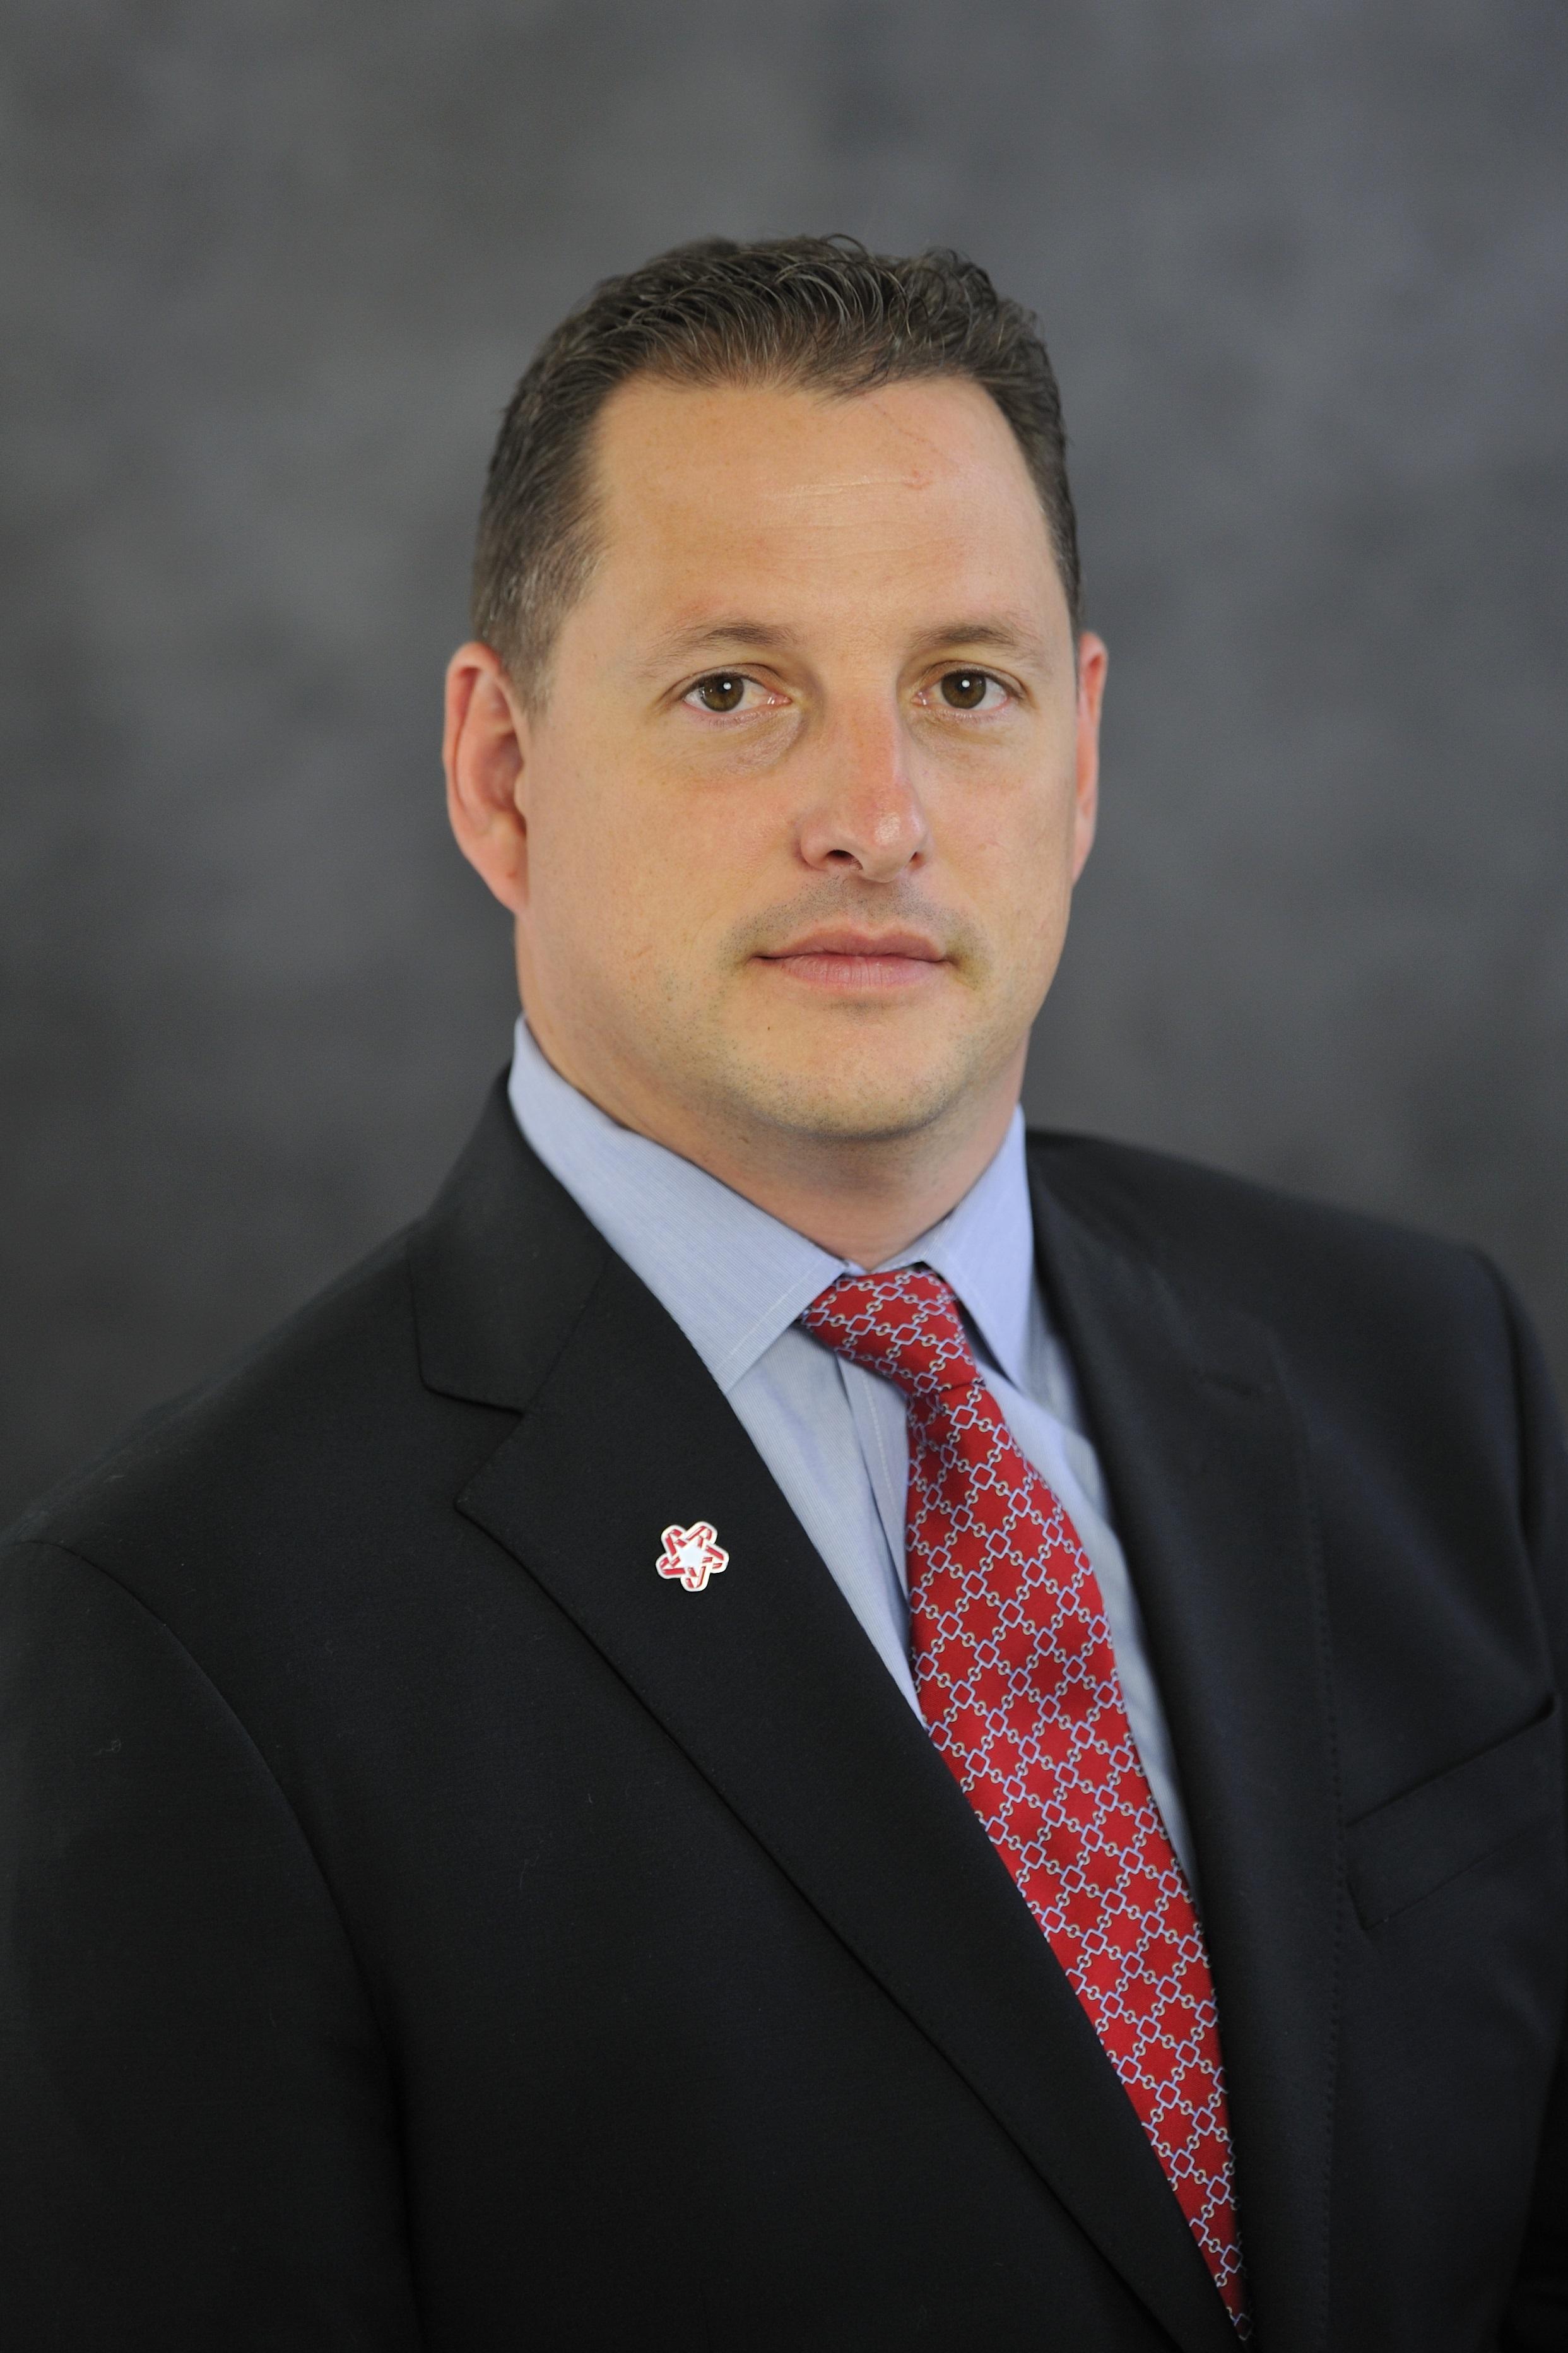 Glenn Kavanagh